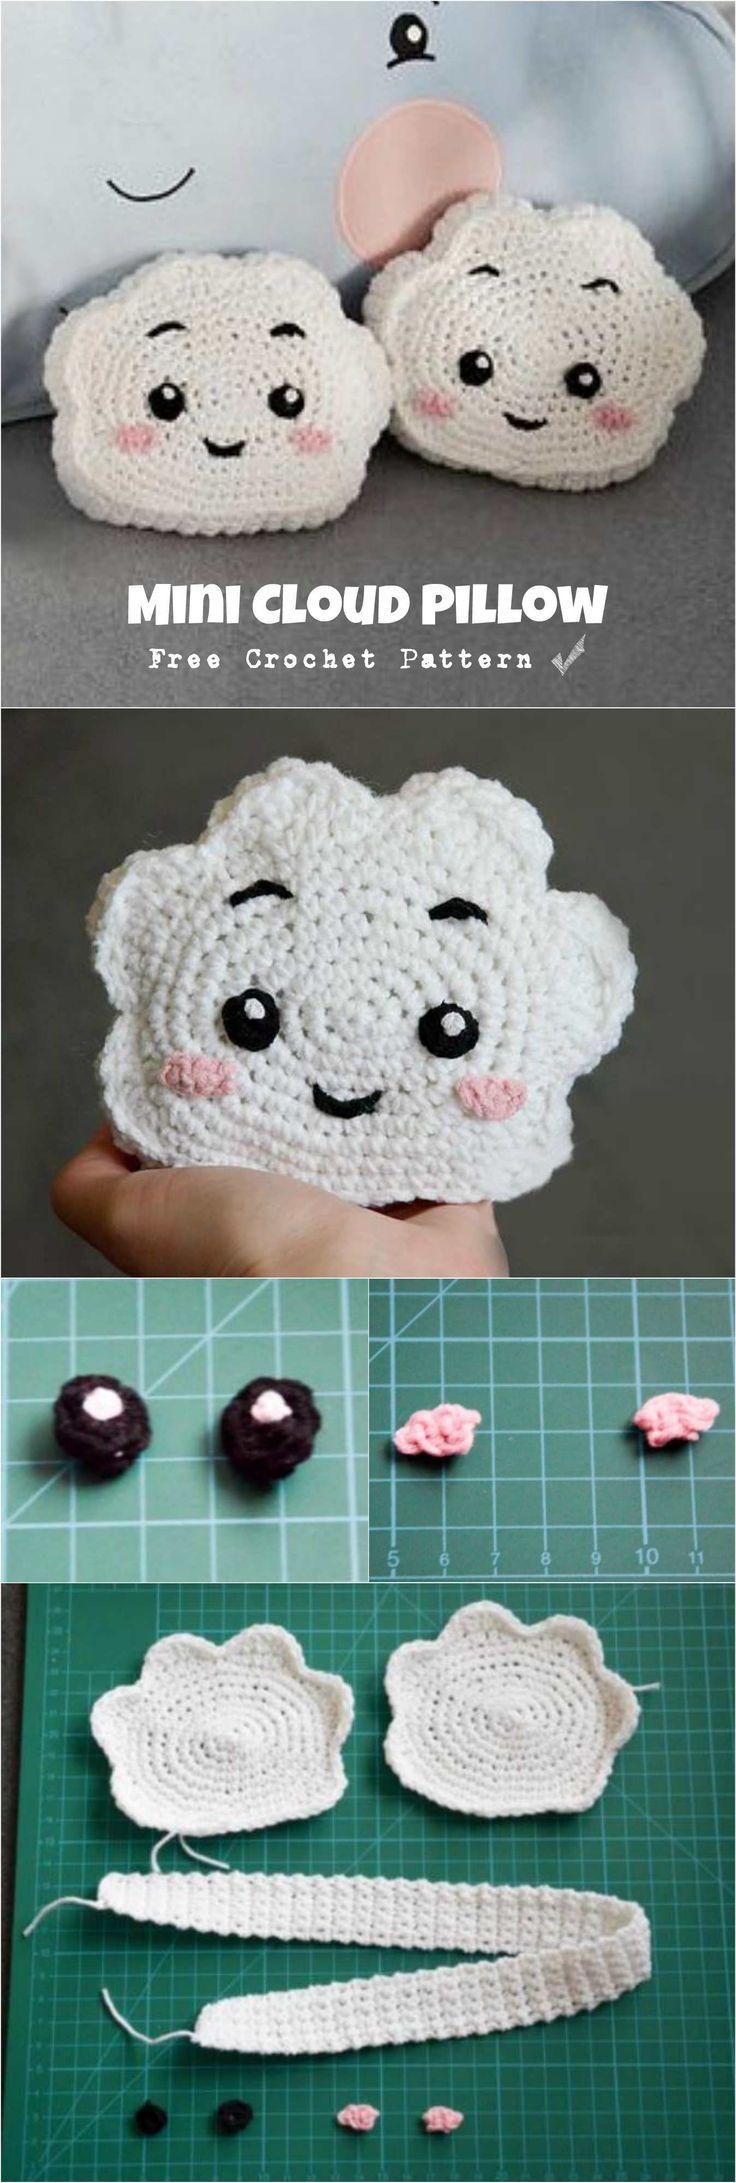 Crochet Mini Cloud Pillow #rose crochet  rosecrochet.com/ #rose #crochet #knitti...